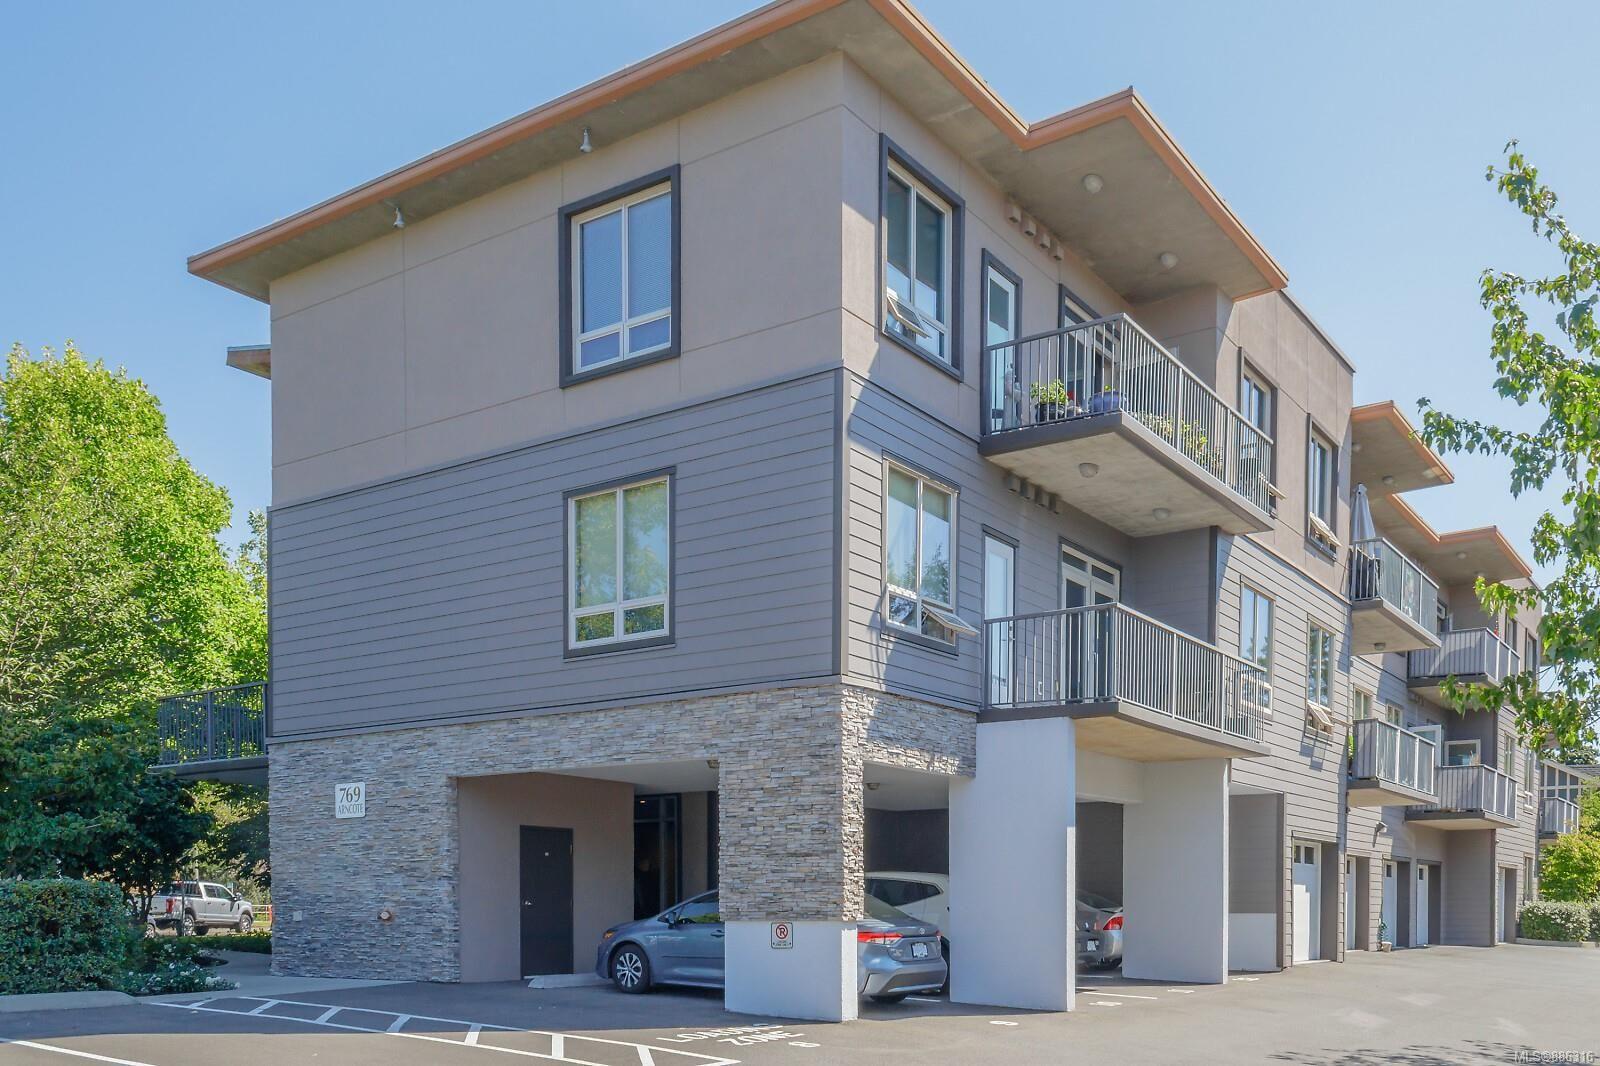 Main Photo: 208 769 Arncote Ave in Langford: La Langford Proper Condo for sale : MLS®# 886316